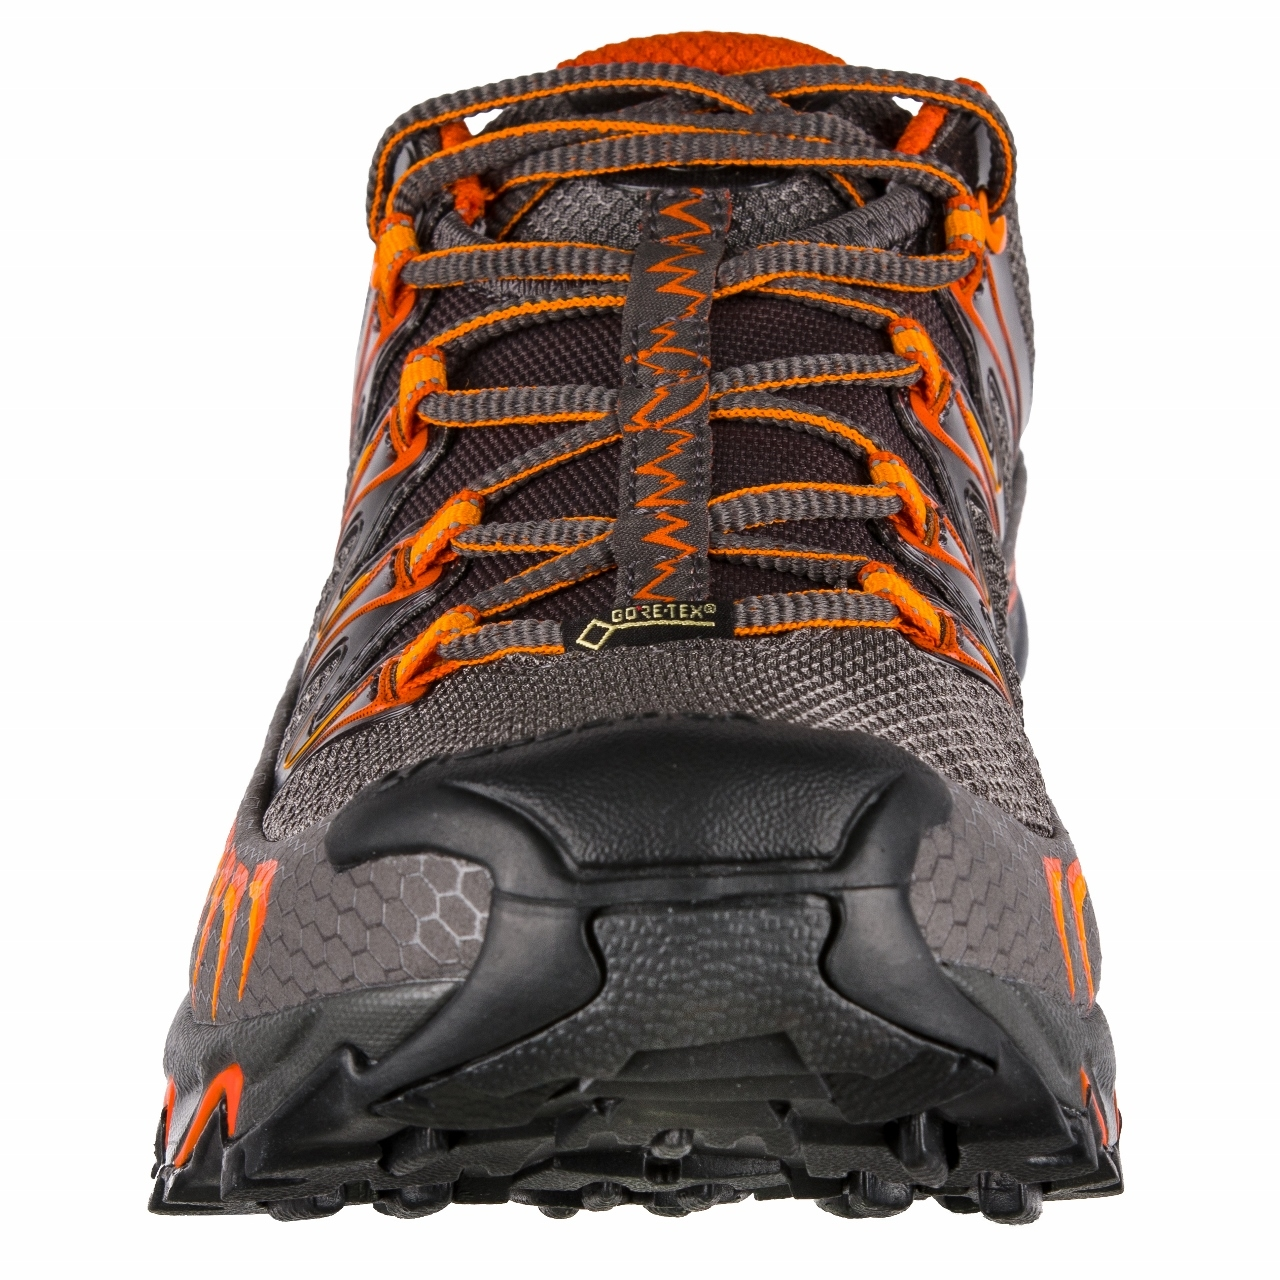 De Trail La Ultra Raptor Sportiva Carbon Gtx Chaussures tshCrdQ